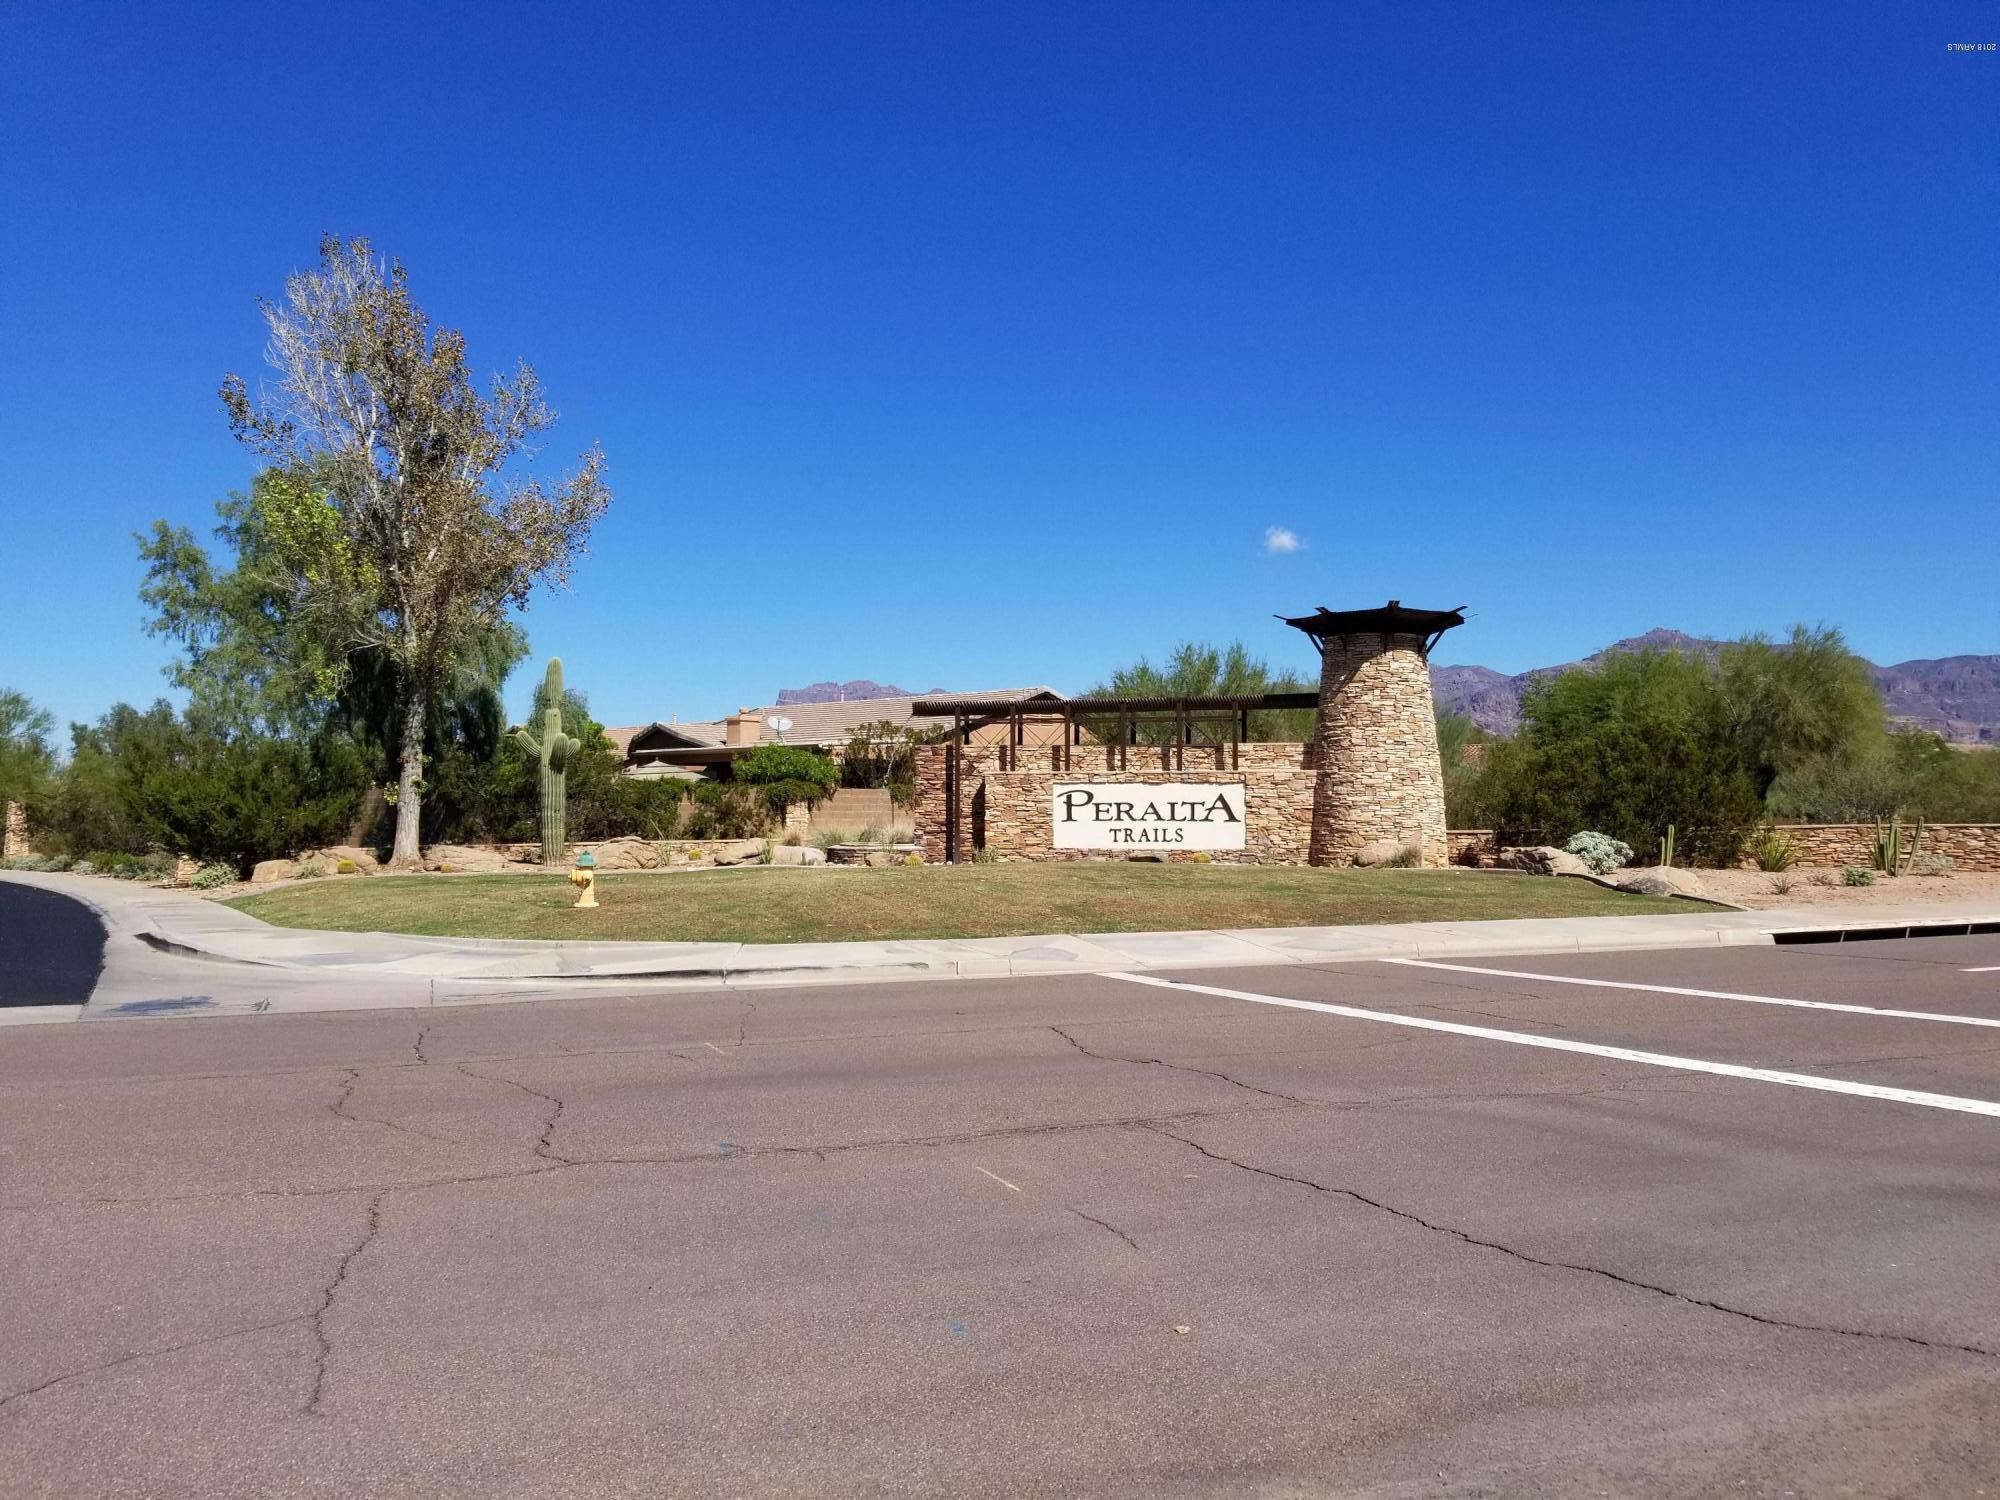 MLS 5821704 10712 E PERALTA CANYON Drive, Gold Canyon, AZ 85118 Gold Canyon AZ Peralta Trails